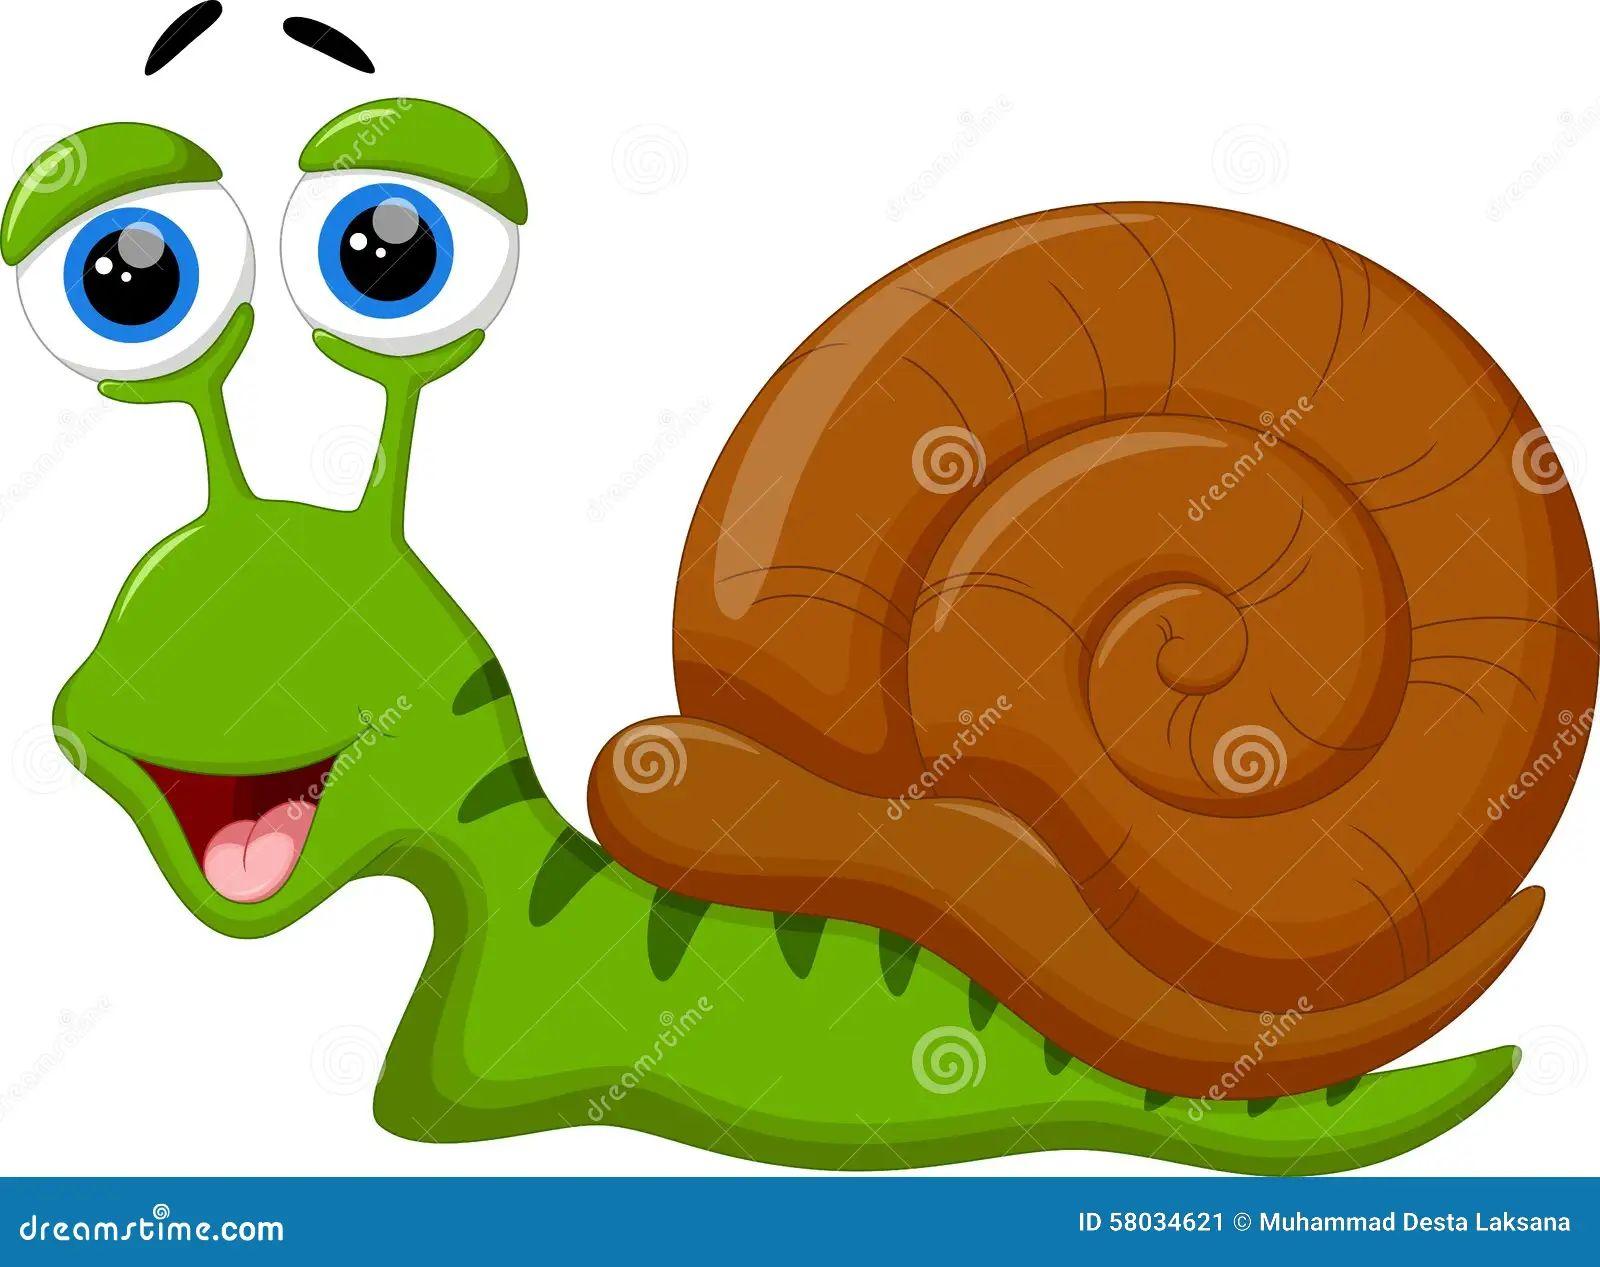 Cute snail cartoon stock illustration image 58034621